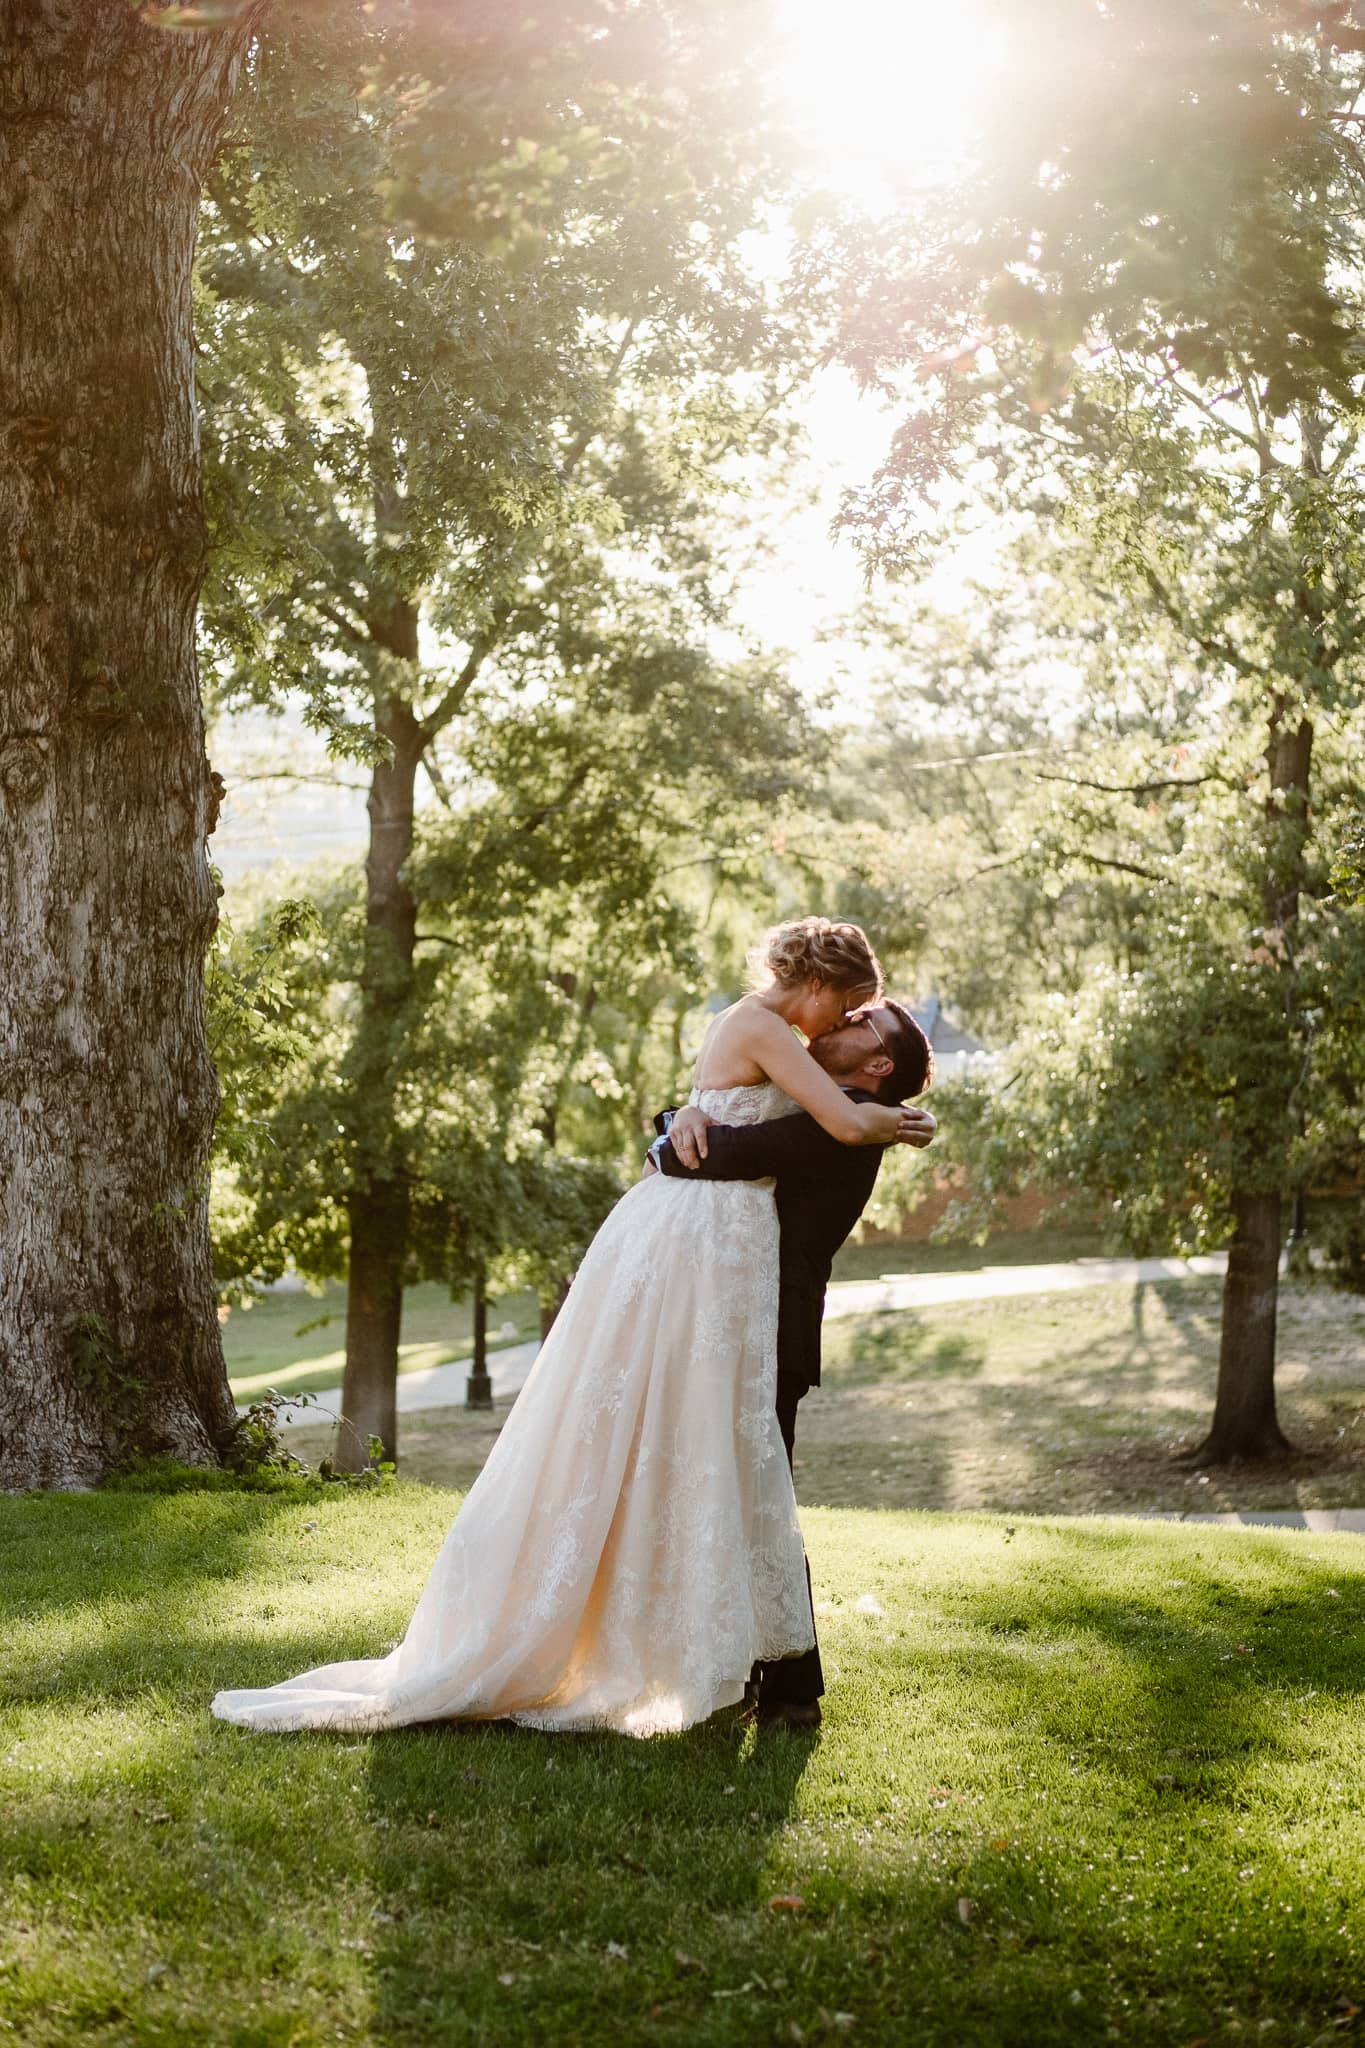 Grant Humphreys Mansion Wedding Photographer, Denver wedding photographer, Colorado wedding photographer, bride and groom portraits, golden hour wedding photos